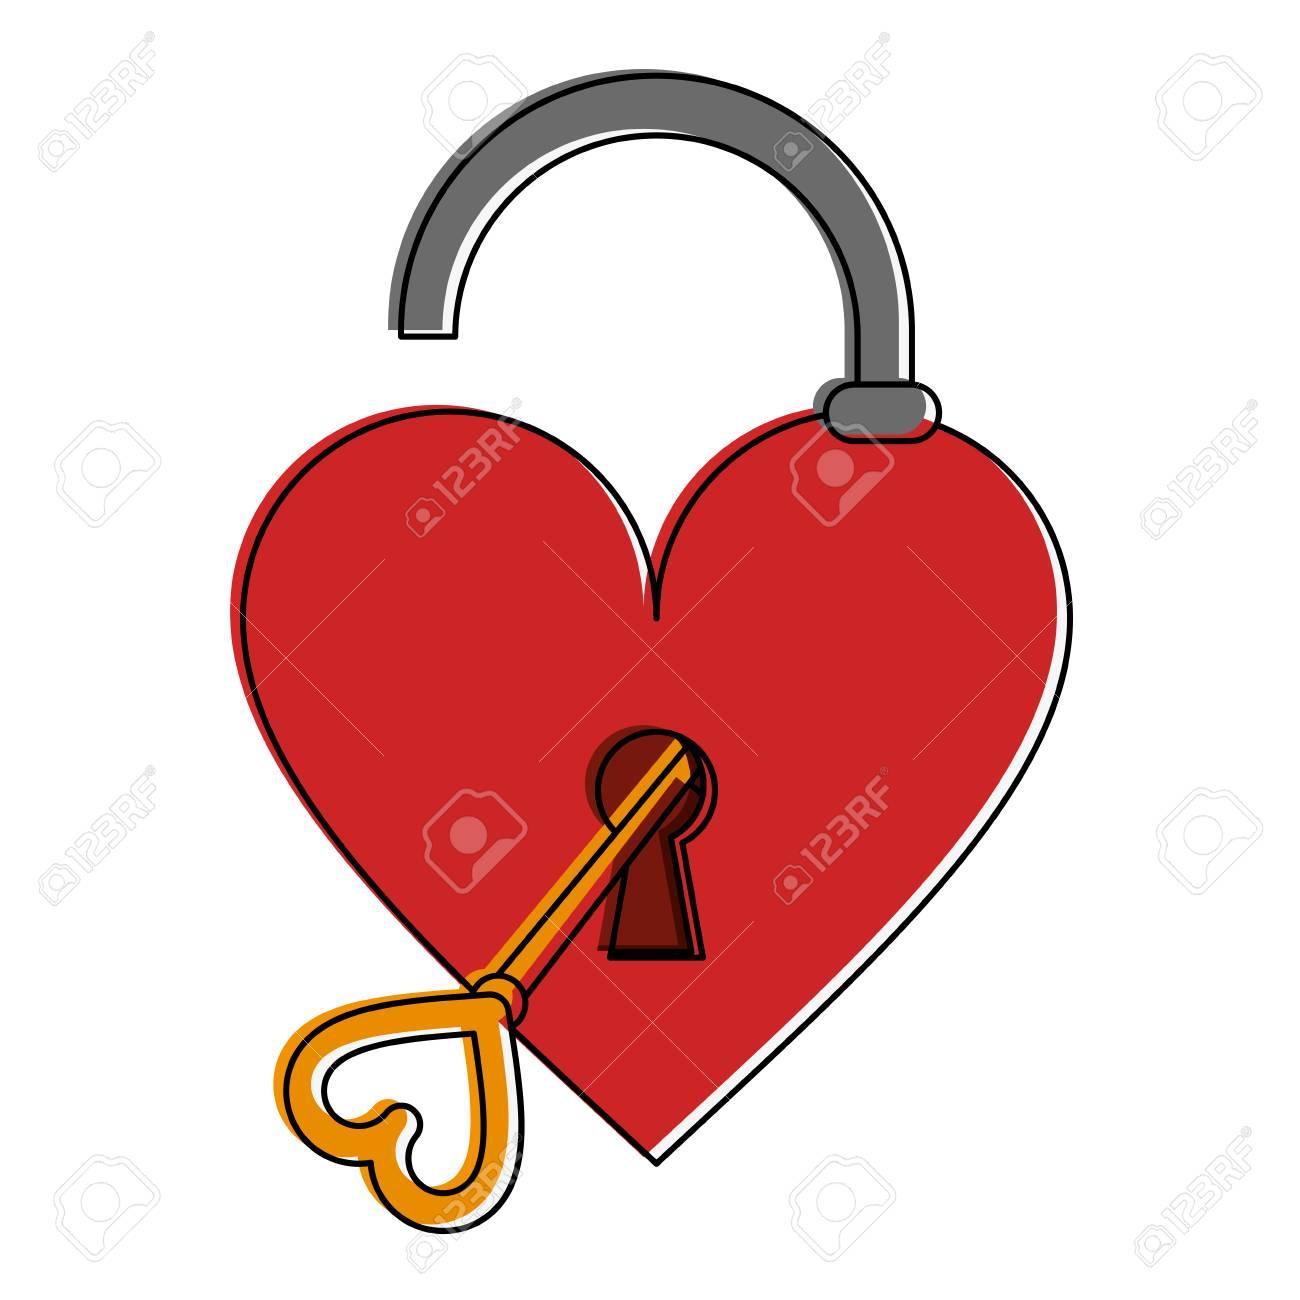 Open heart shape safety lock with key valentines day related open heart shape safety lock with key valentines day related icon image vector illustration design stock buycottarizona Gallery